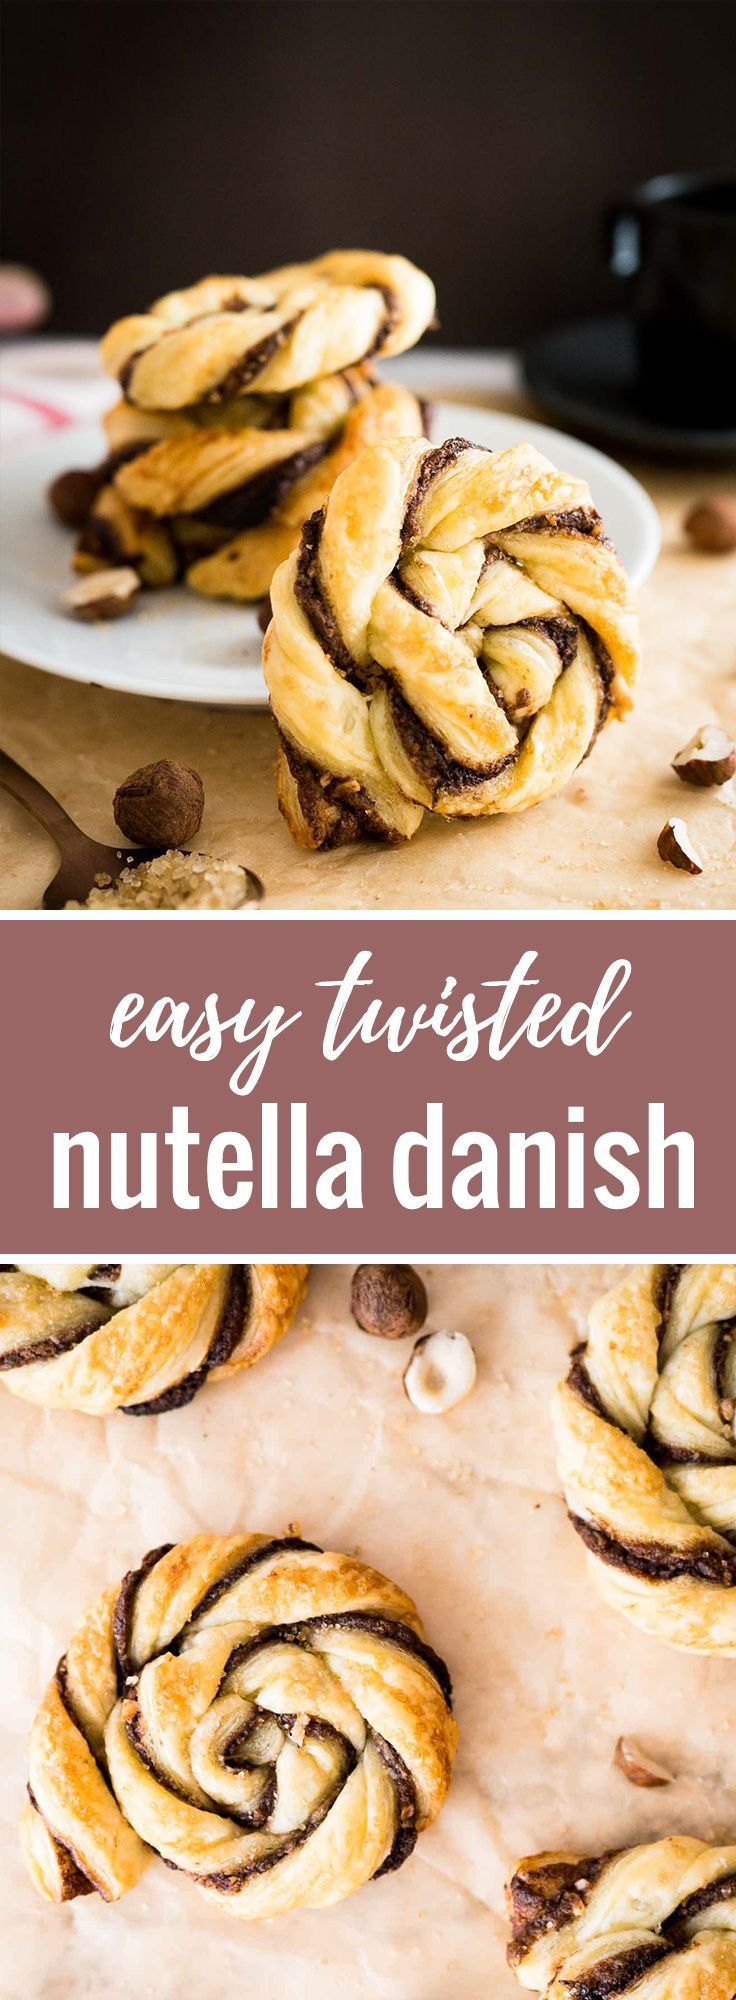 Easy Twisted Nutella Danish Recipe